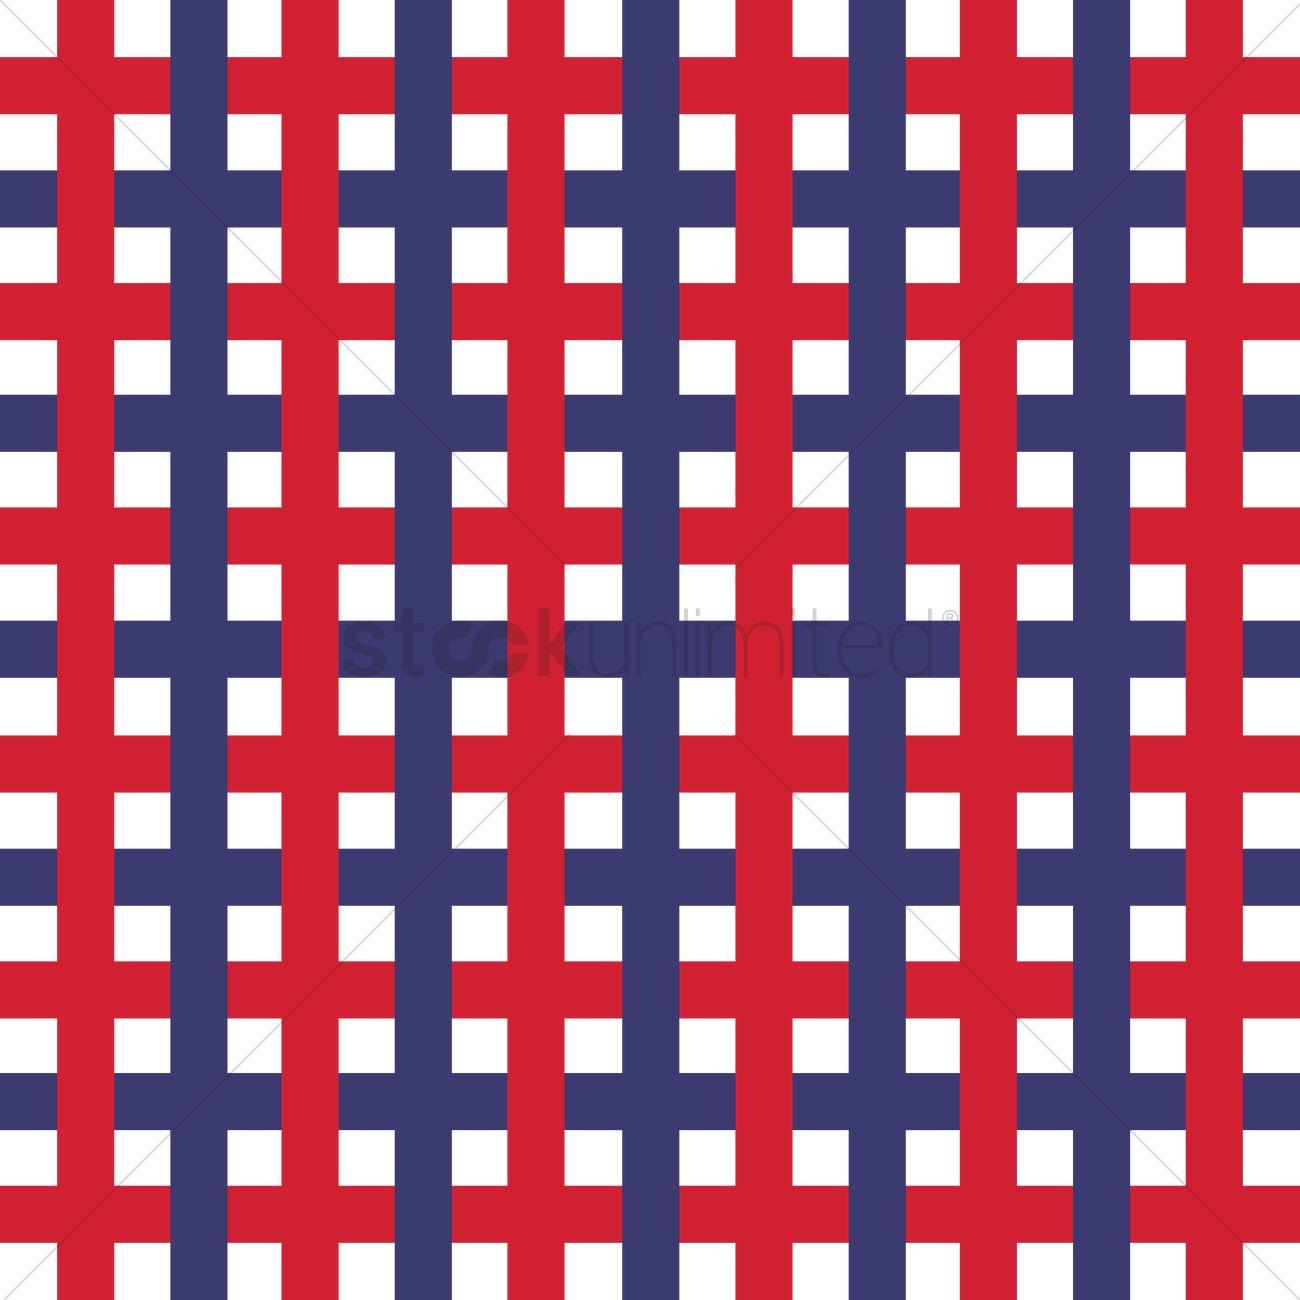 Checkered Design Checkered Design Vector Image 1557937 Stockunlimited